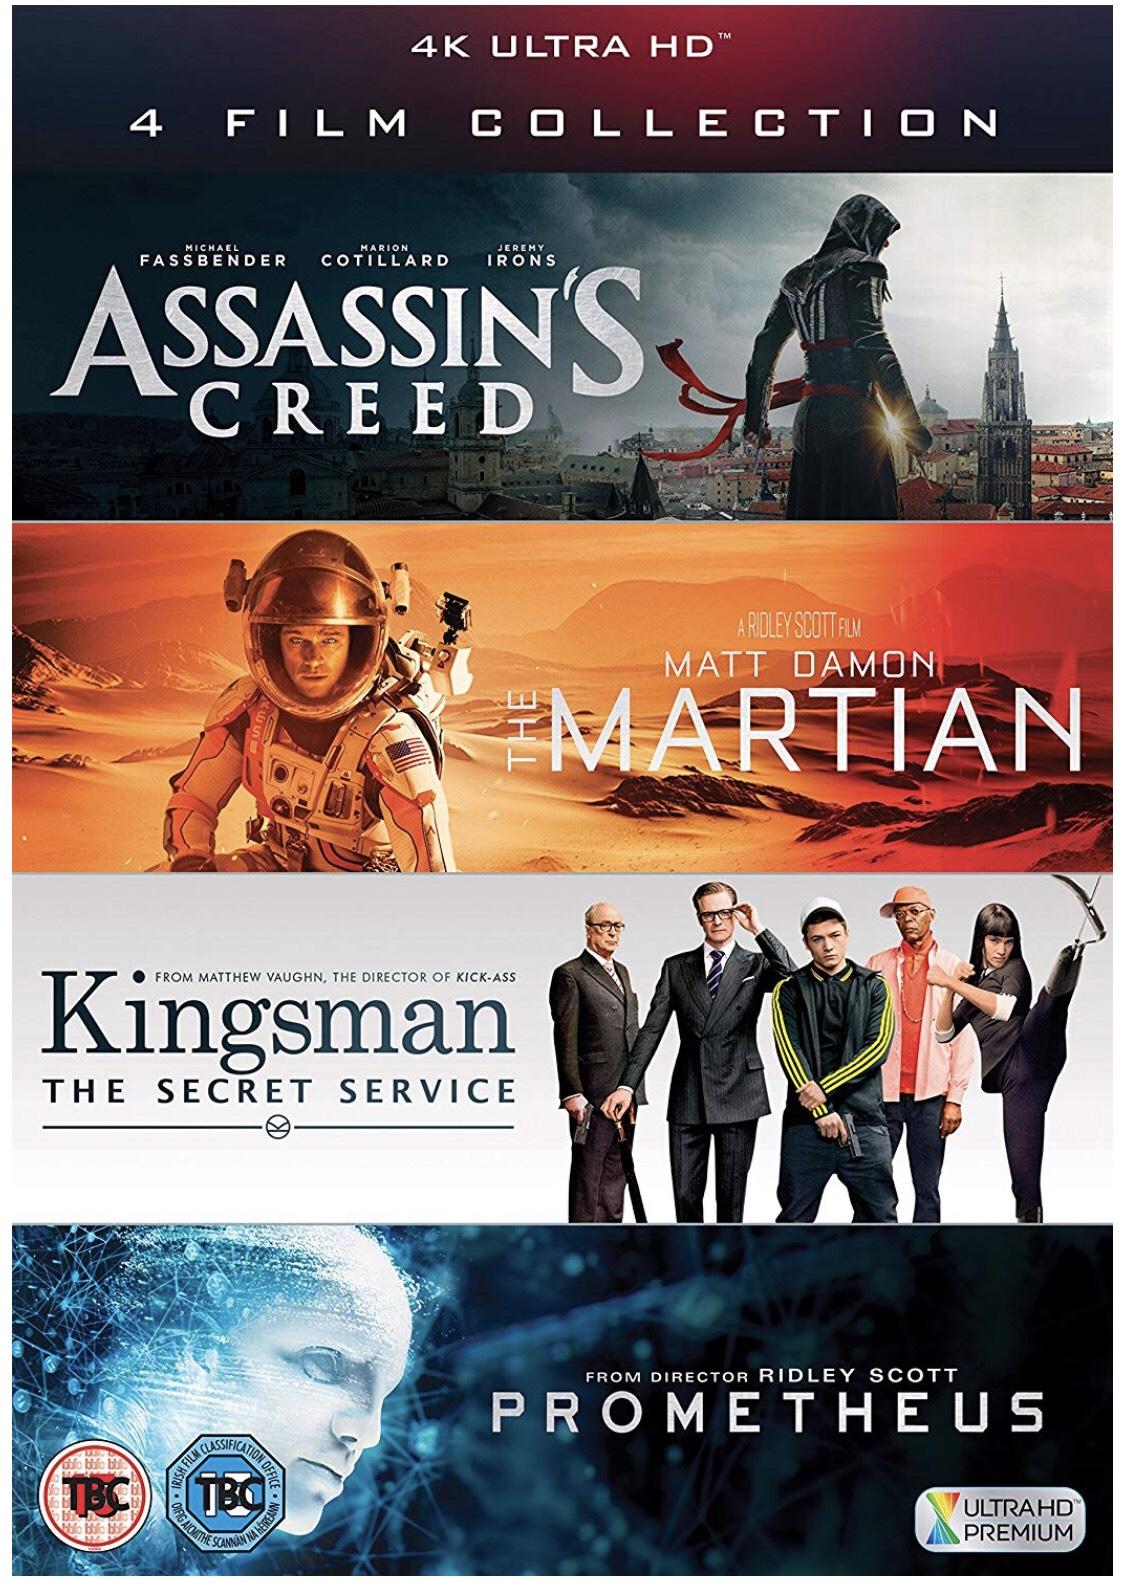 4K UHD Film Collection (Assassin's Creed, The Martian, Kingsman & Prometheus @ Amazon